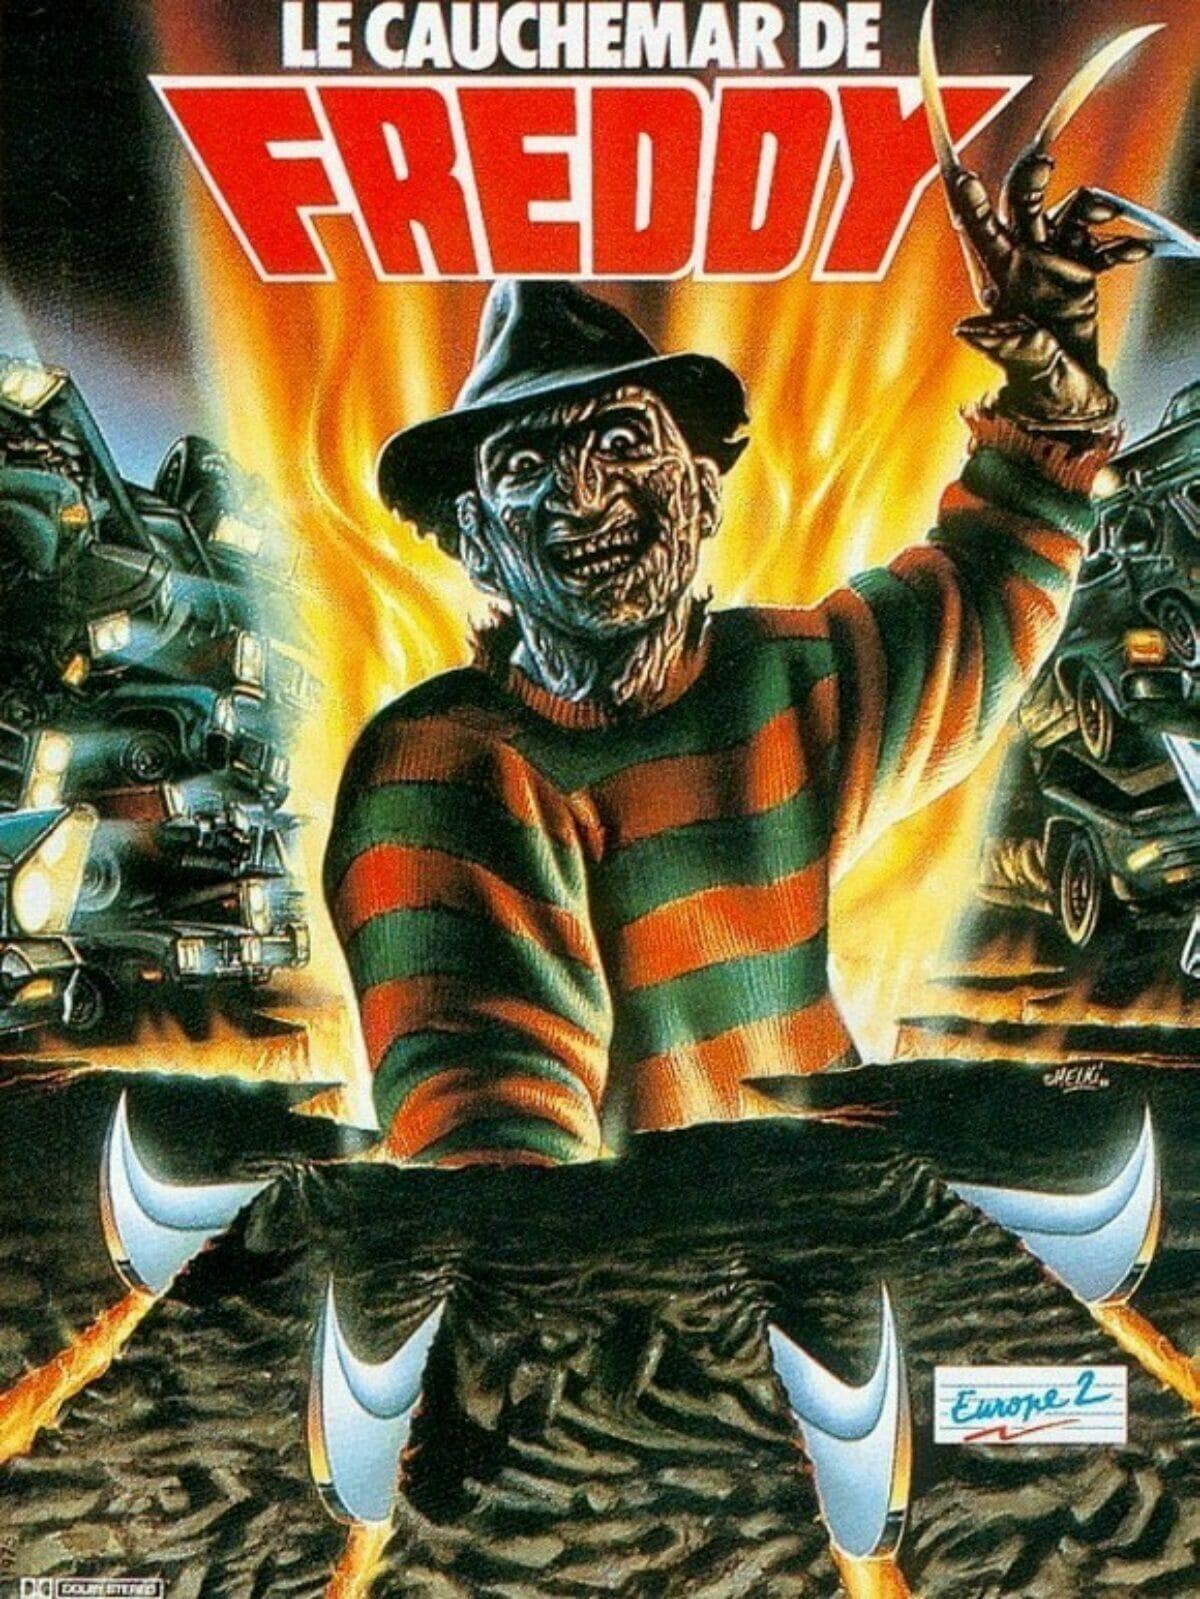 Le-Cauchemar-de-Freddy-poster